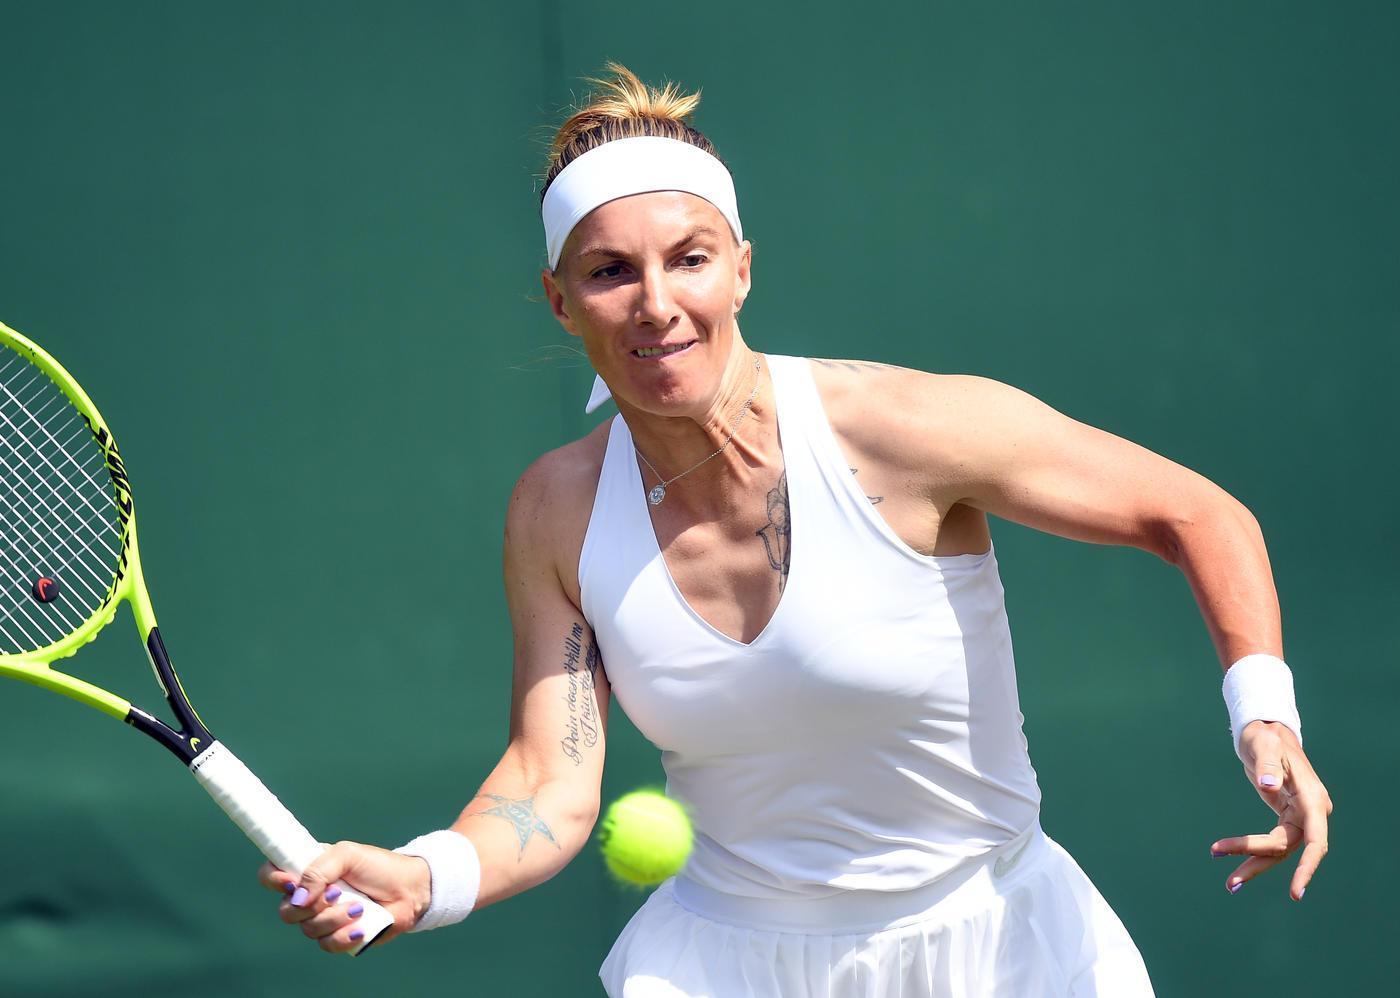 Кузнецова одержала победу над Каролиной Плишковой на турнире в Цинциннати - фото